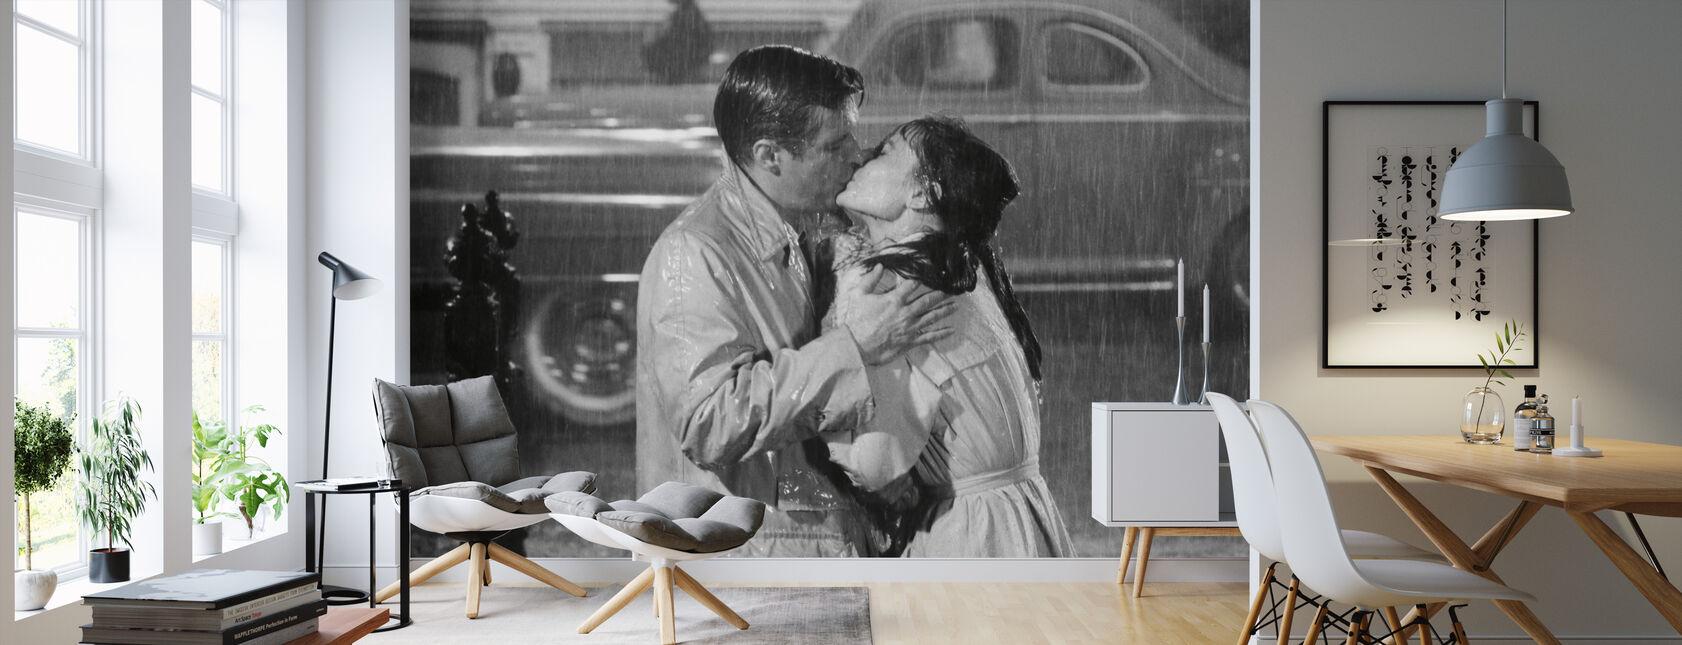 Audrey Hepburn and George Peppard in Breakfast at Tiffanys - Wallpaper - Living Room